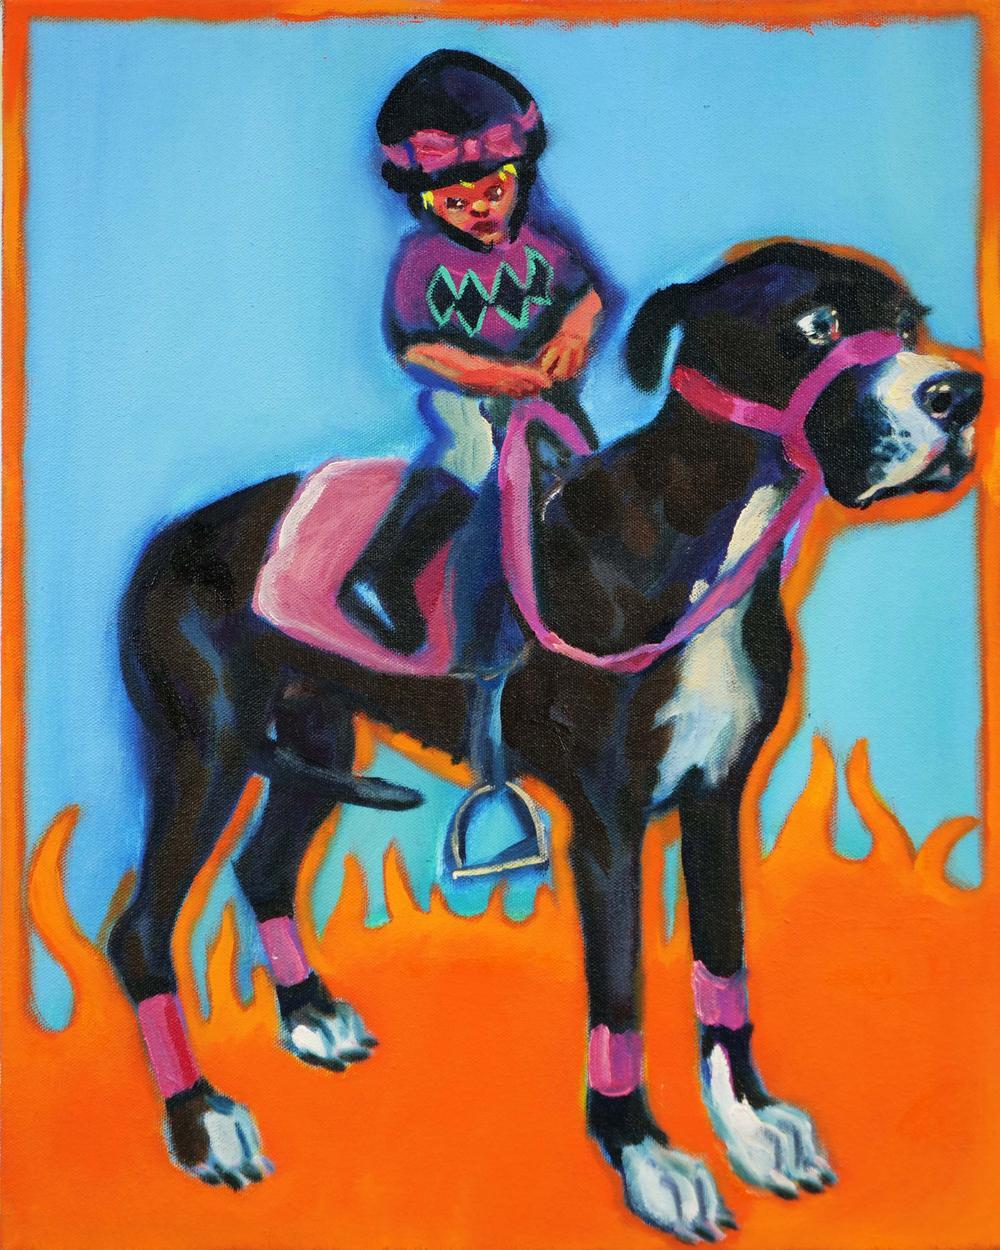 119Jockey_ 2019_Oil on canvas_50x40 cm